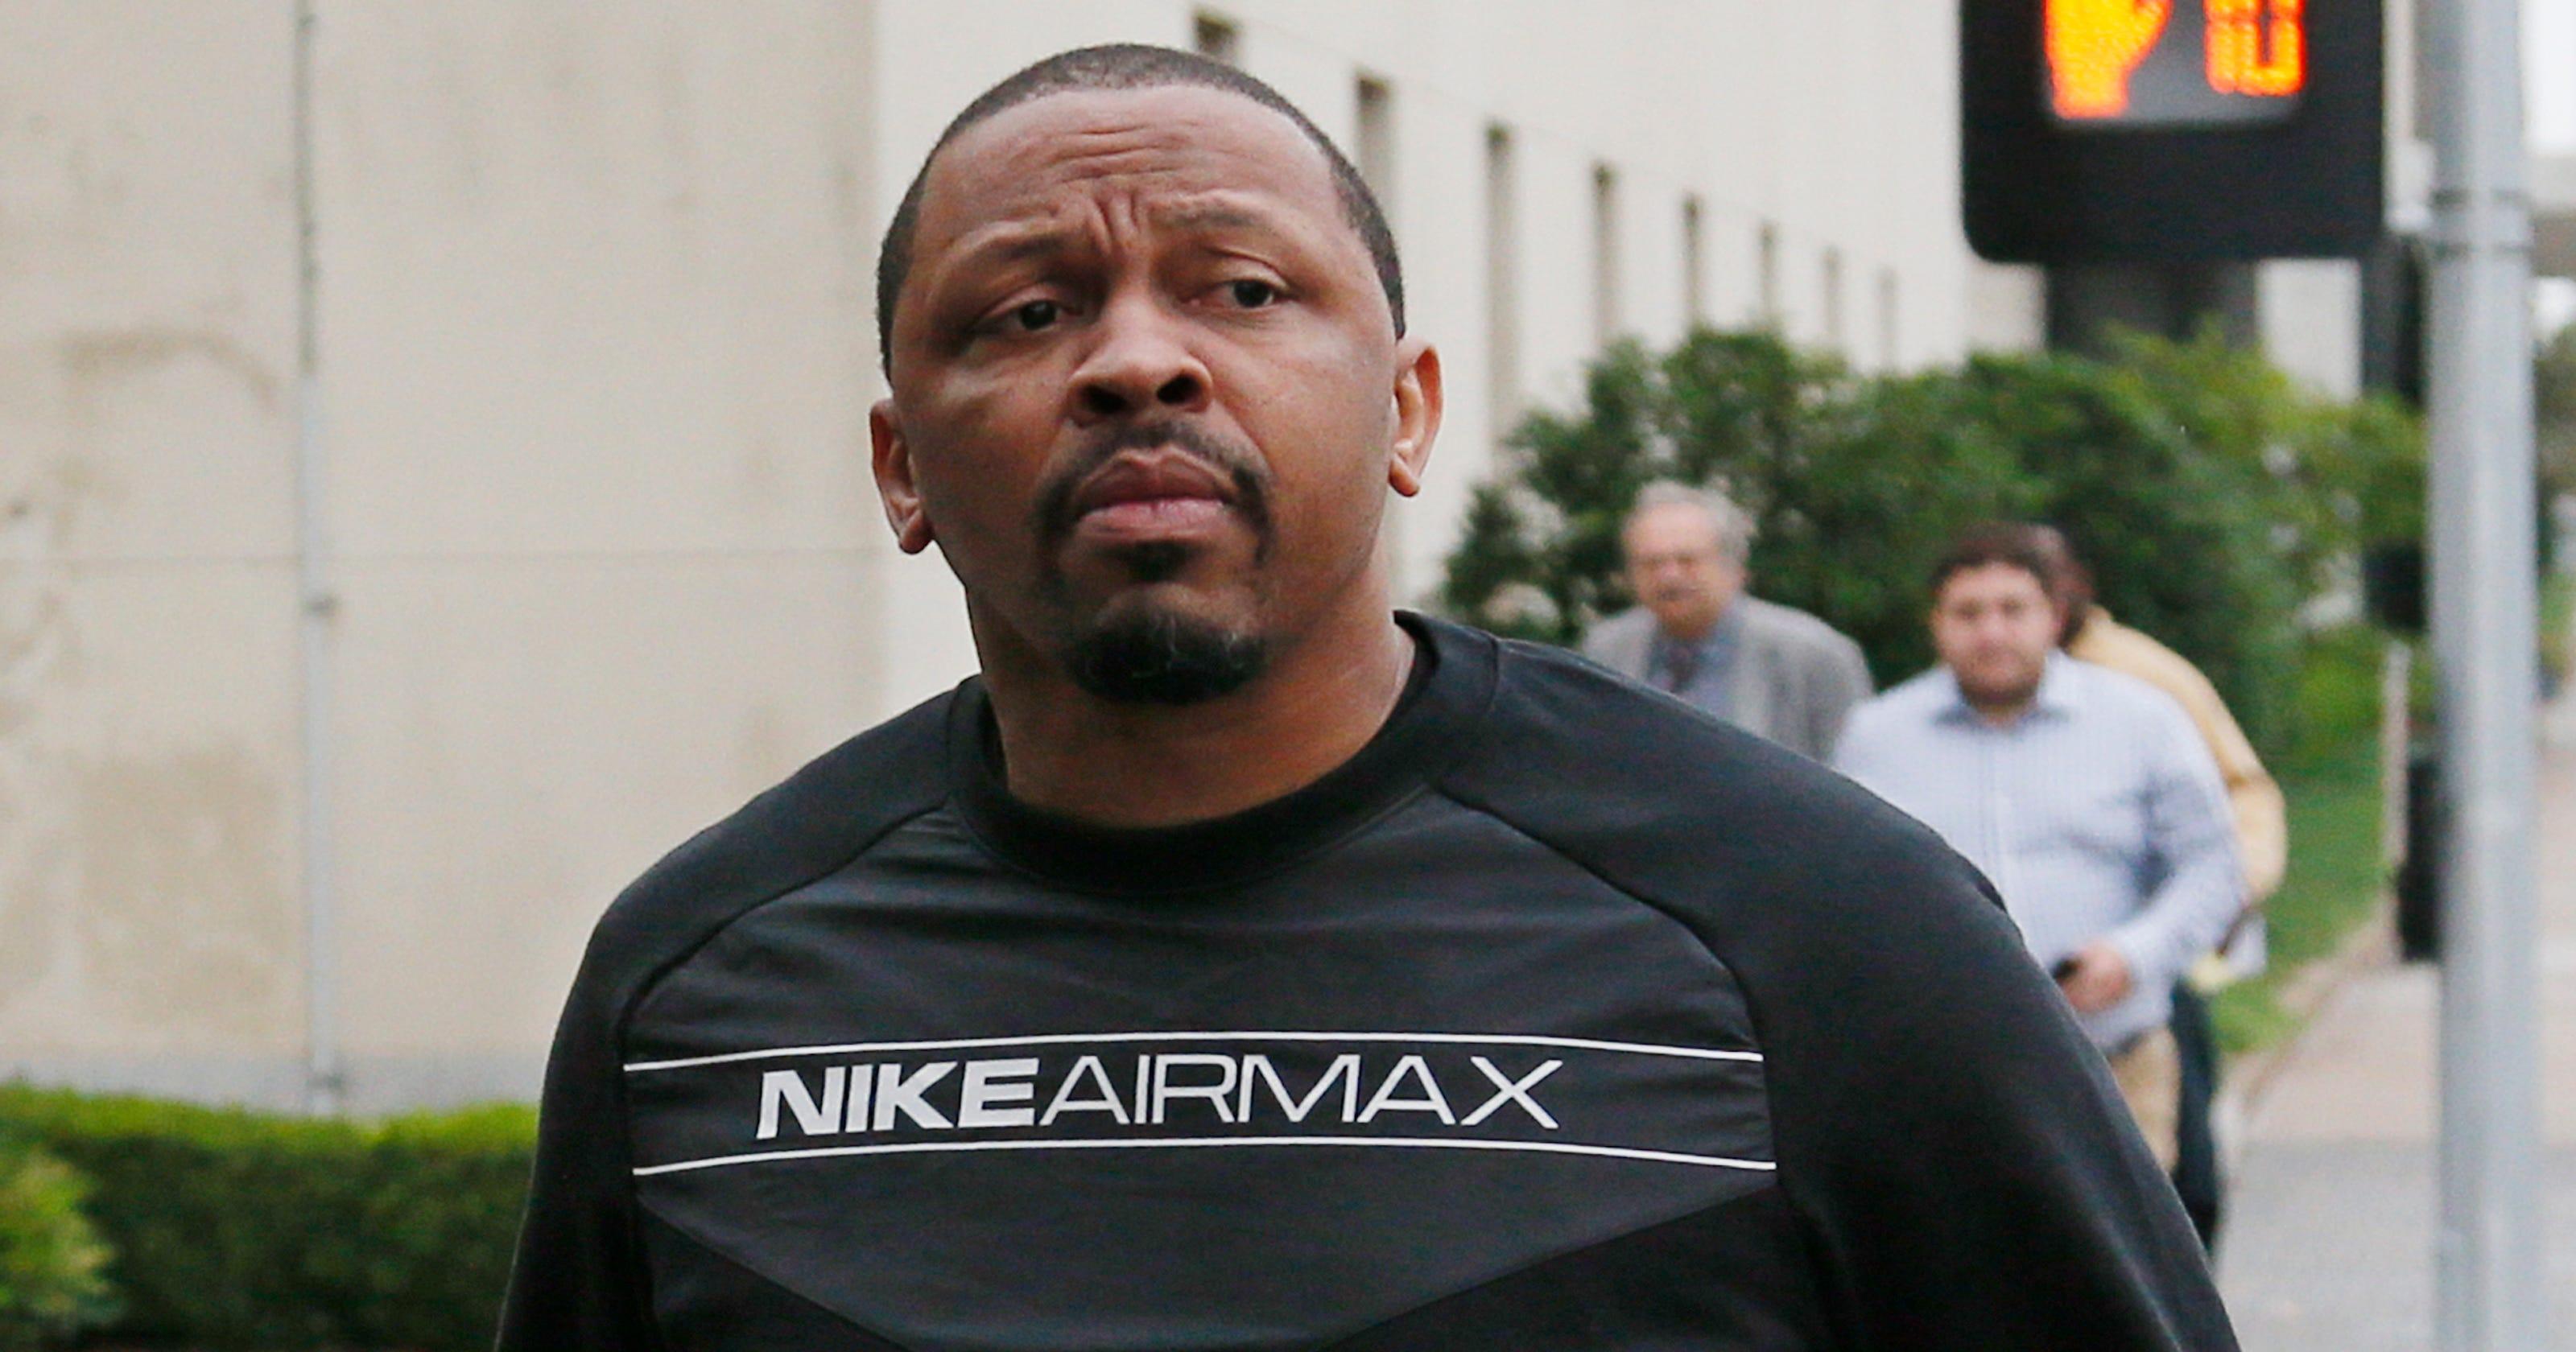 USC men\'s basketball faced subpoena in Lamont Evans bribery probe